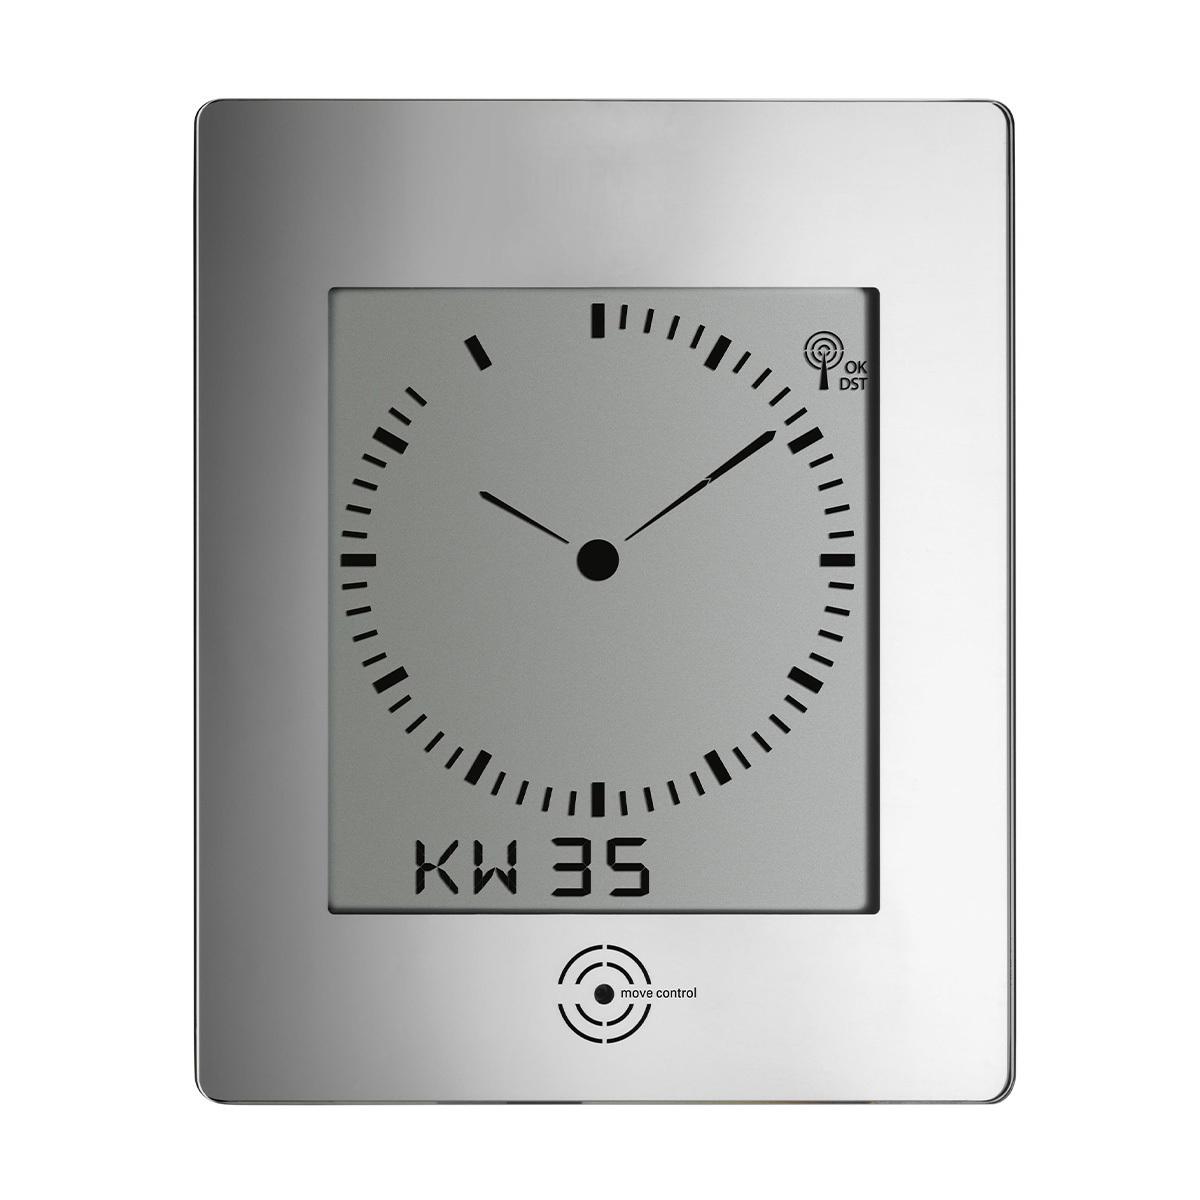 60-4507-digitale-funk-wanduhr-mit-analogem-zifferblatt-raumklima-datum-ansicht4-1200x1200px.jpg